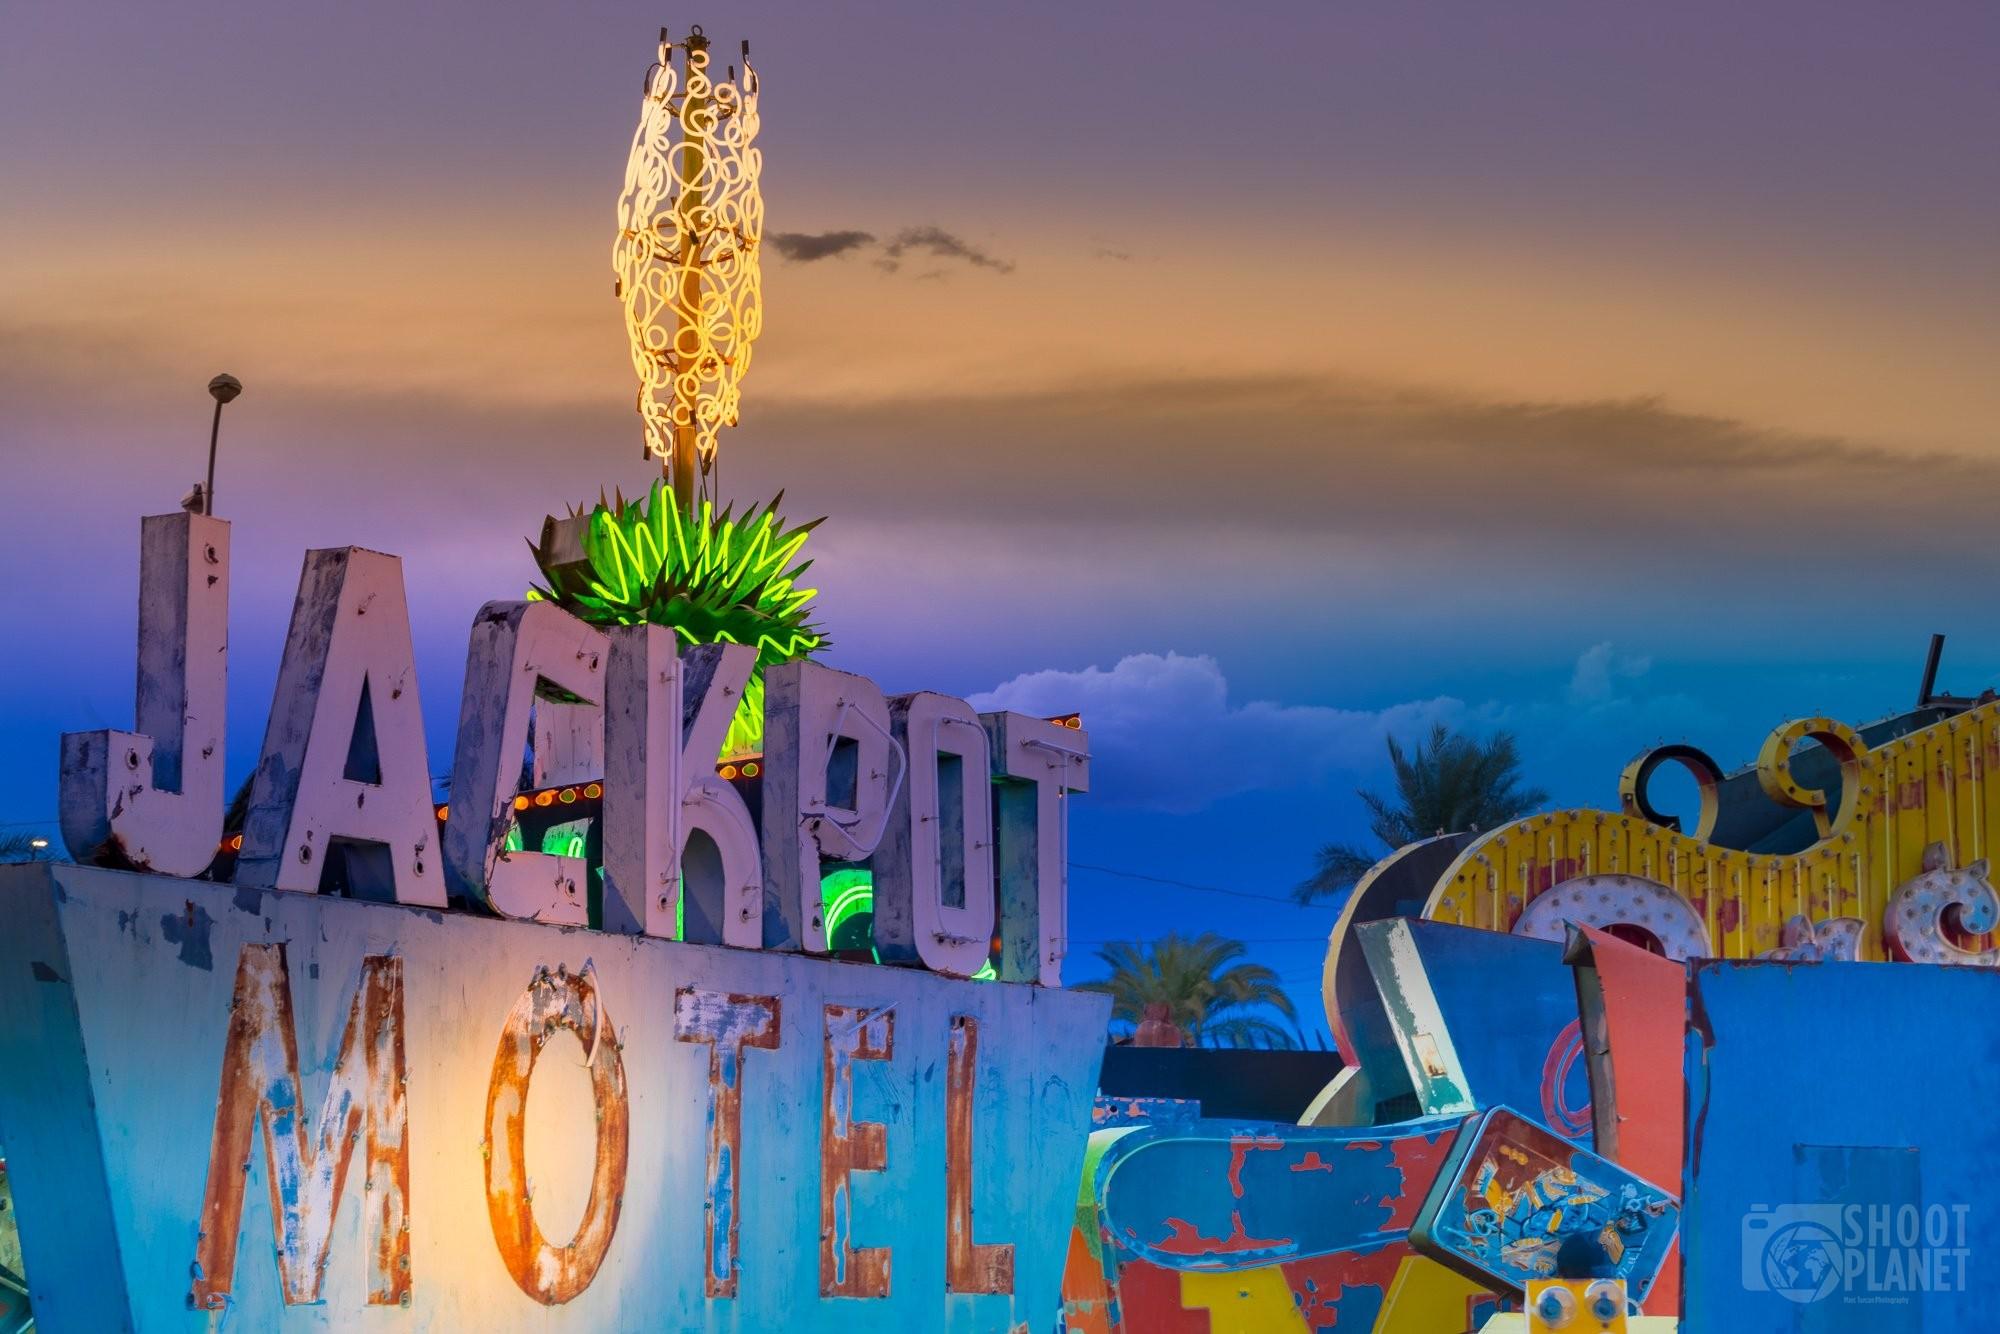 Jackpot motel neon sign Las Vegas, USA